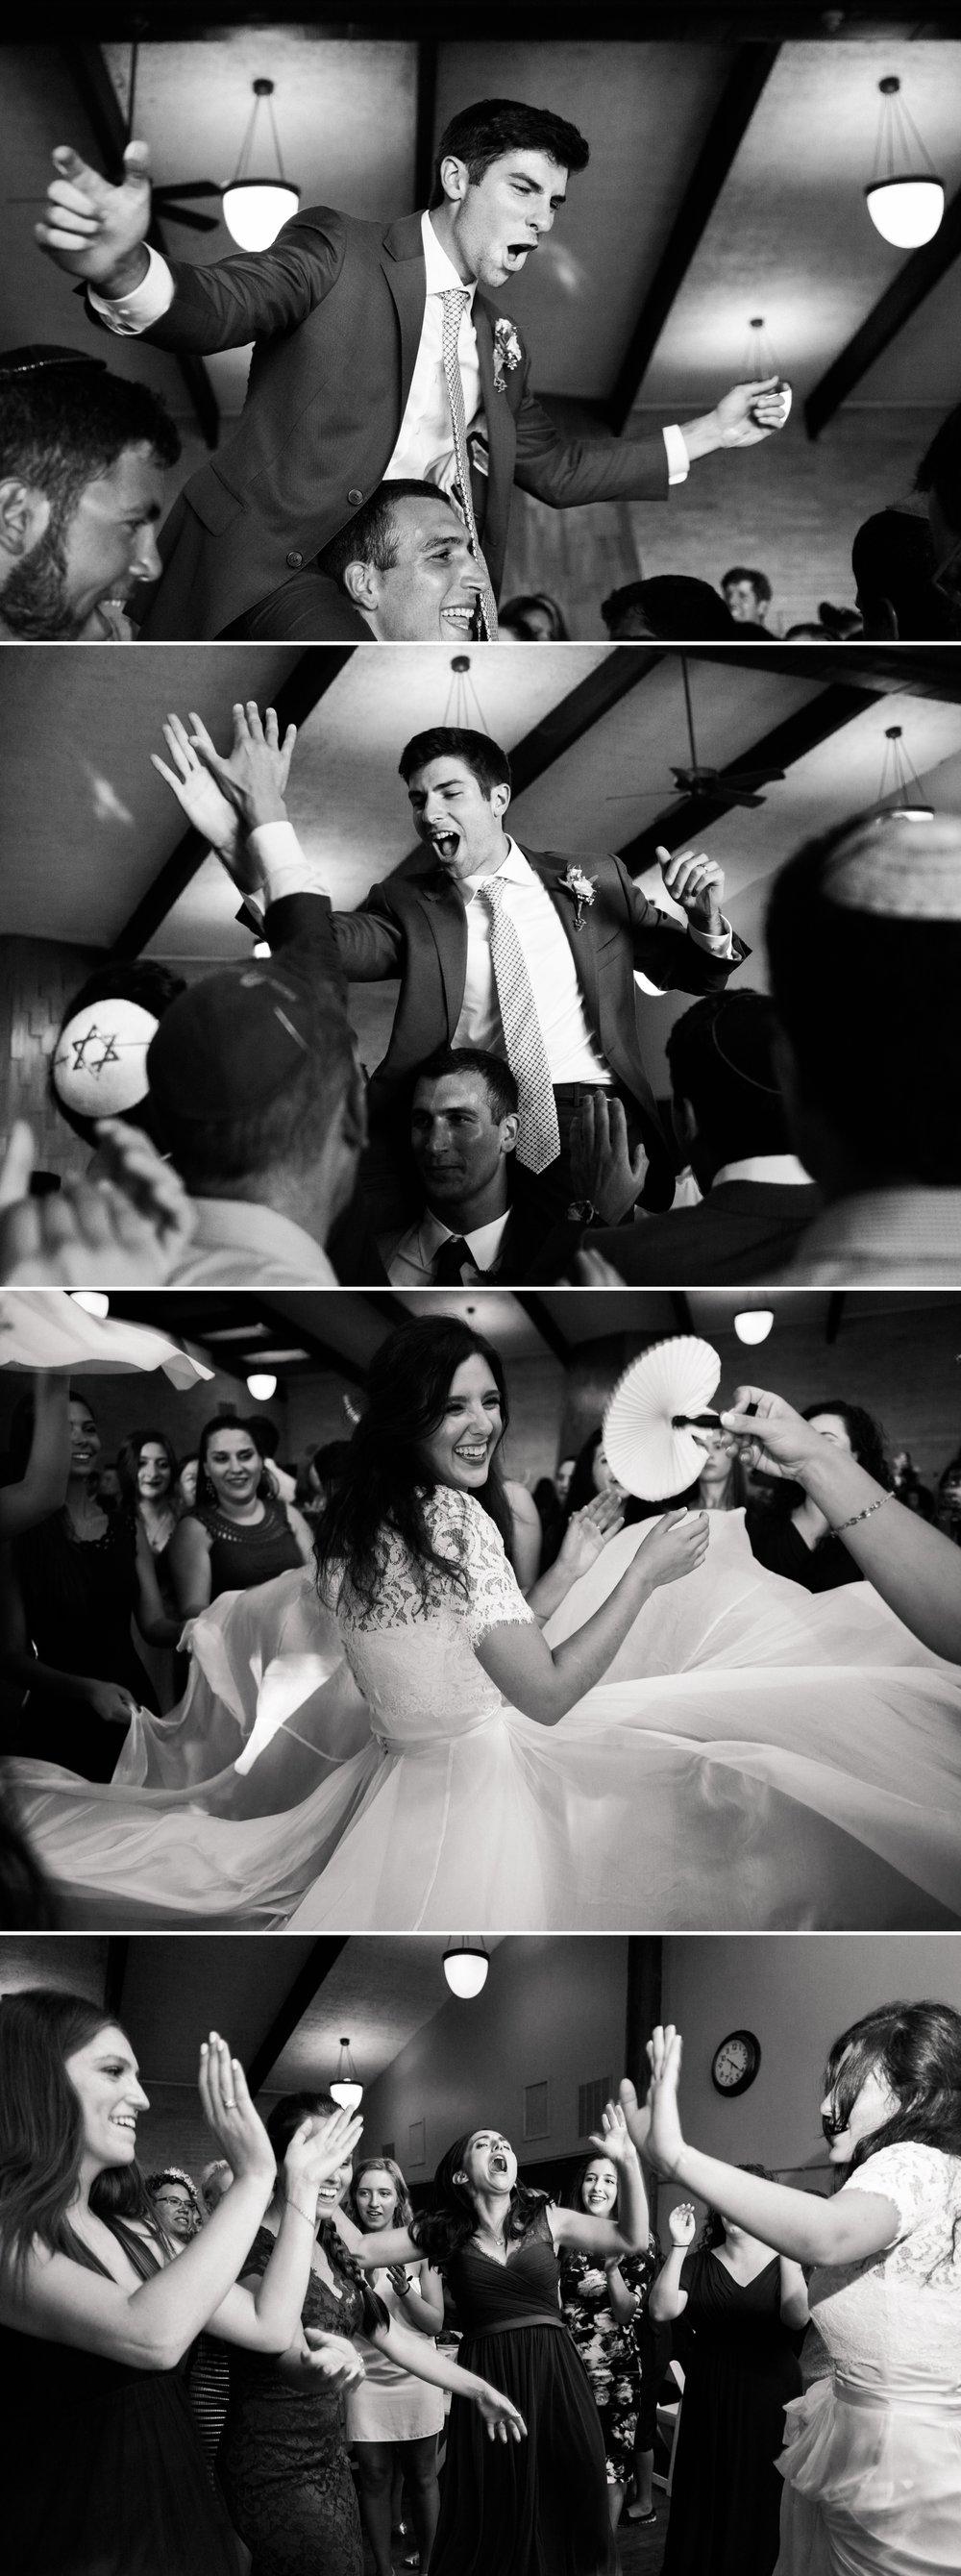 15-fun-jewish-wedding-dancing.jpg